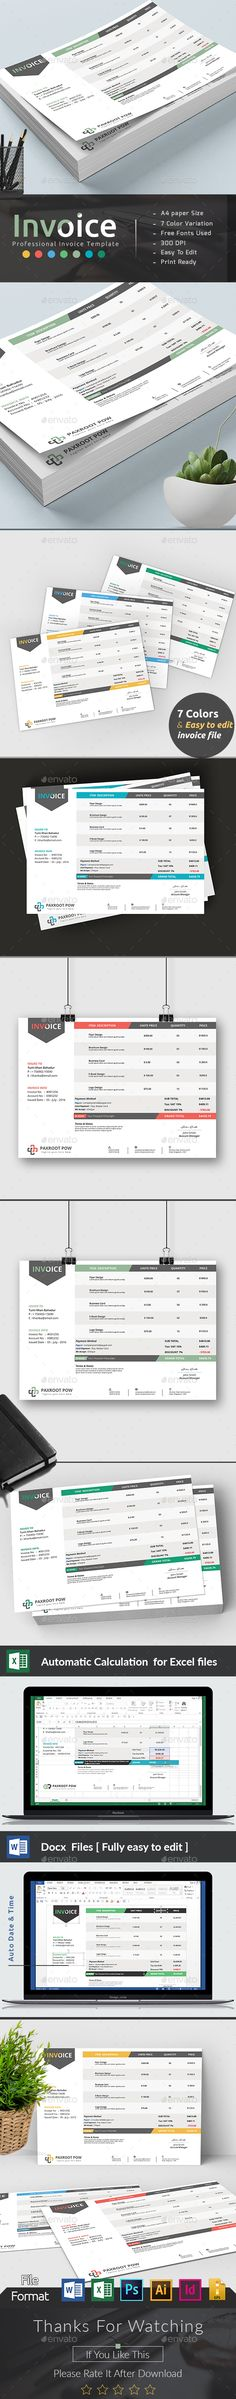 Job Analysis Worksheet Template Template, Worksheets and Job analysis - excel balance sheet template